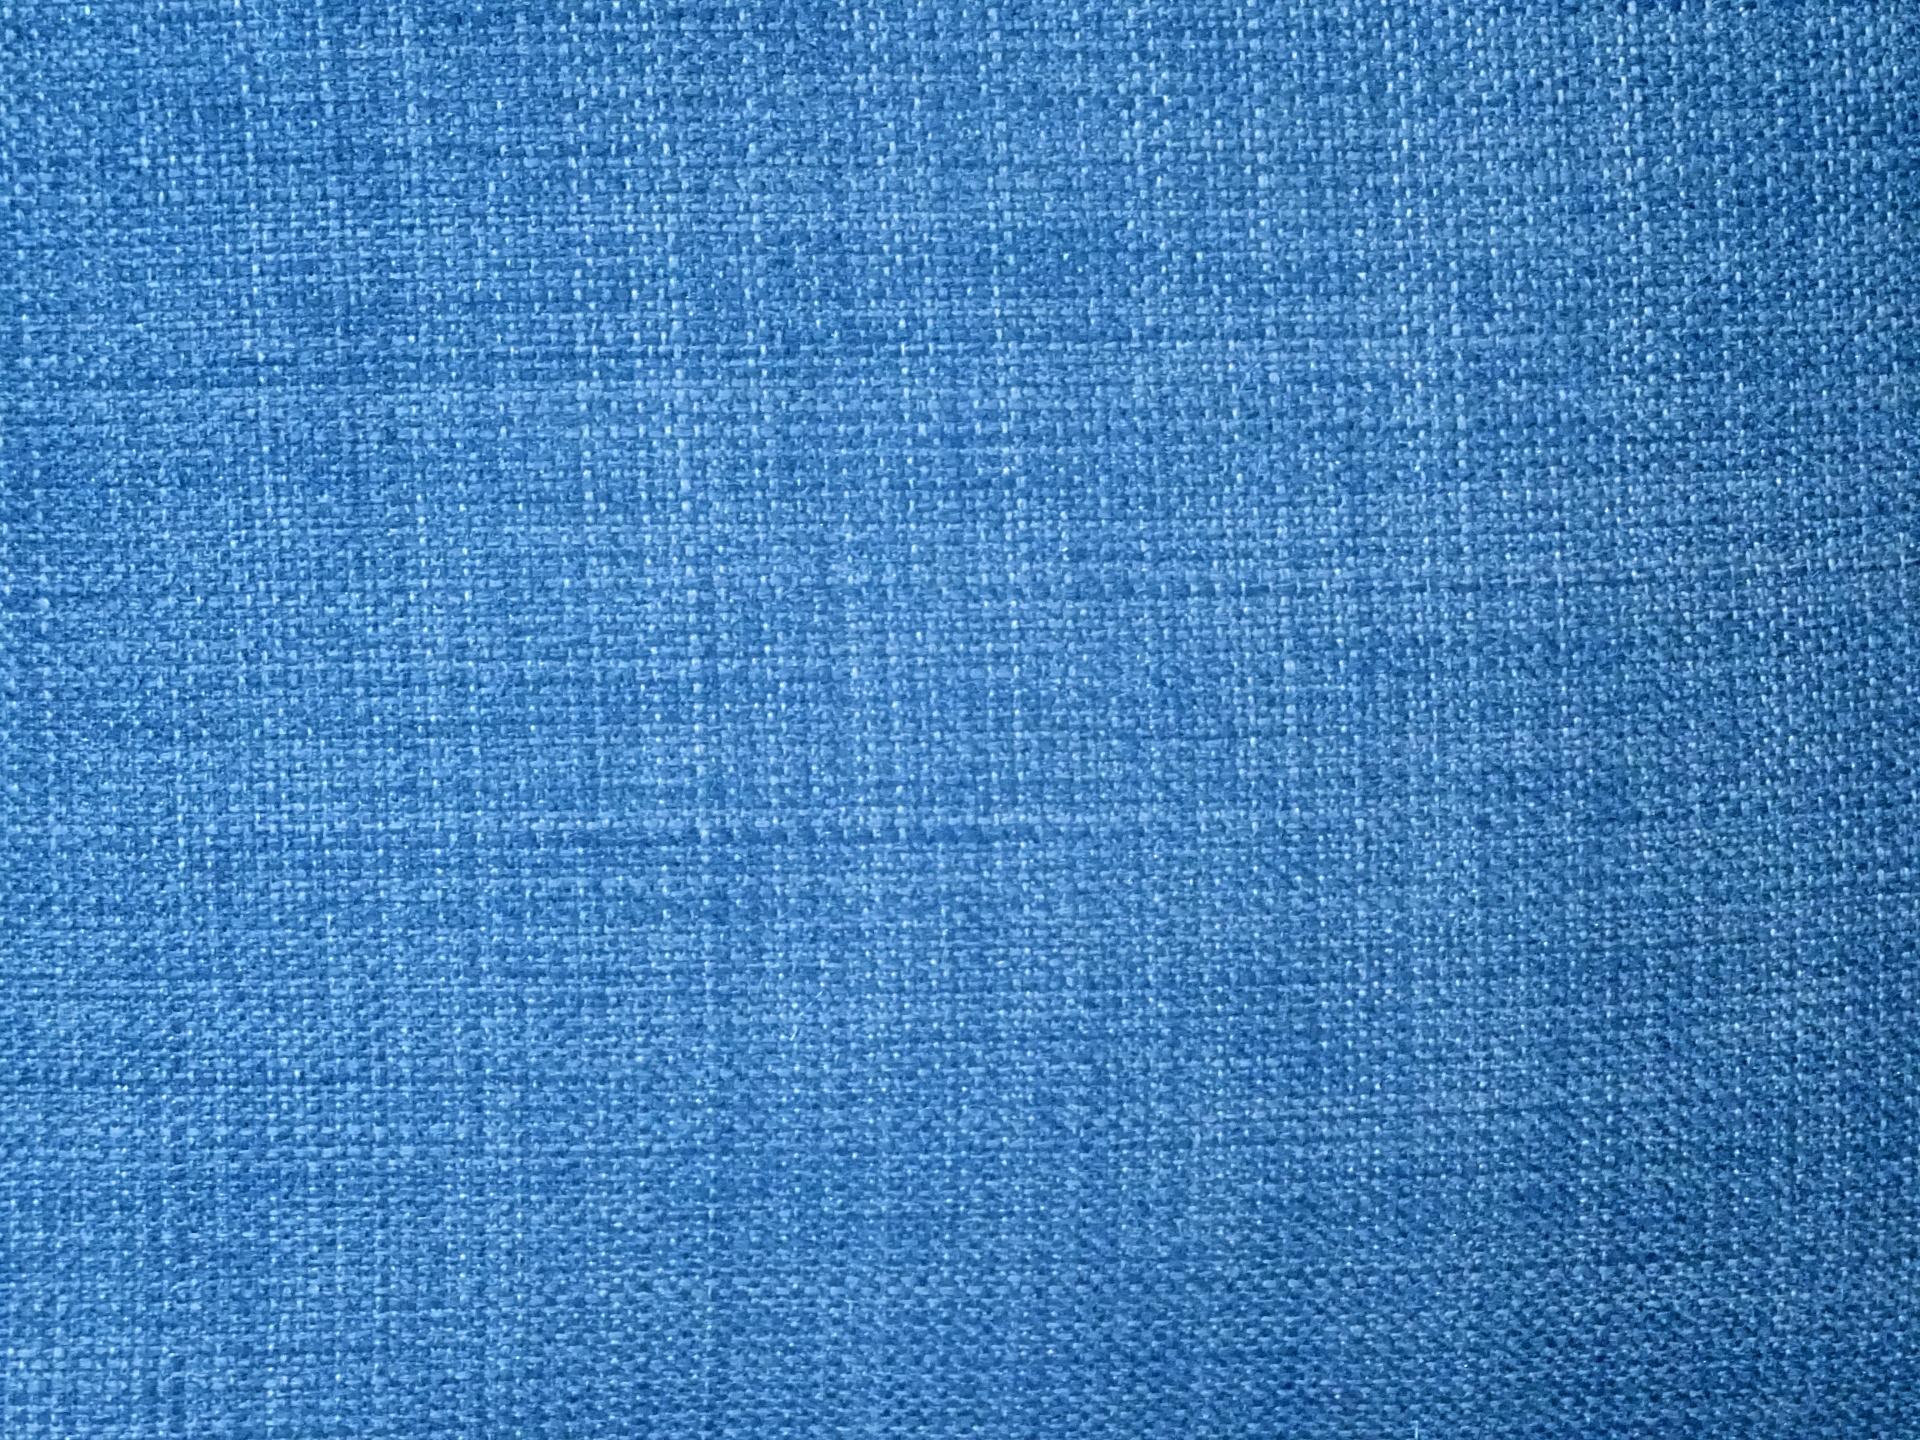 Blue Fabric Textured Background Free Stock Photo - Public Domain ...